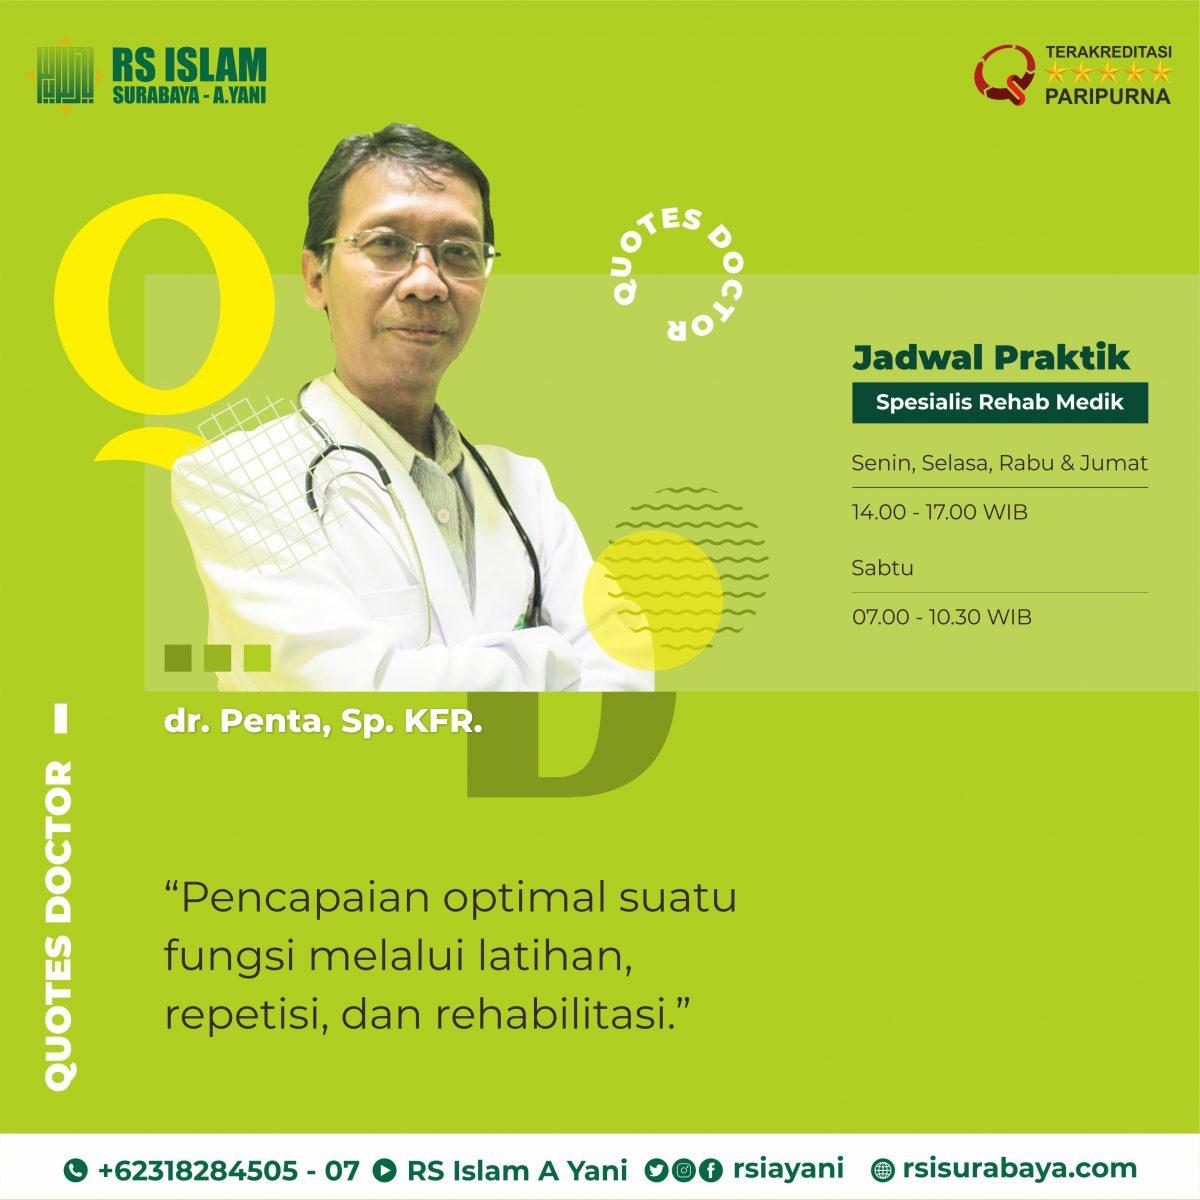 dr.-Penta-Sp.KFR_-1200x1200.jpg